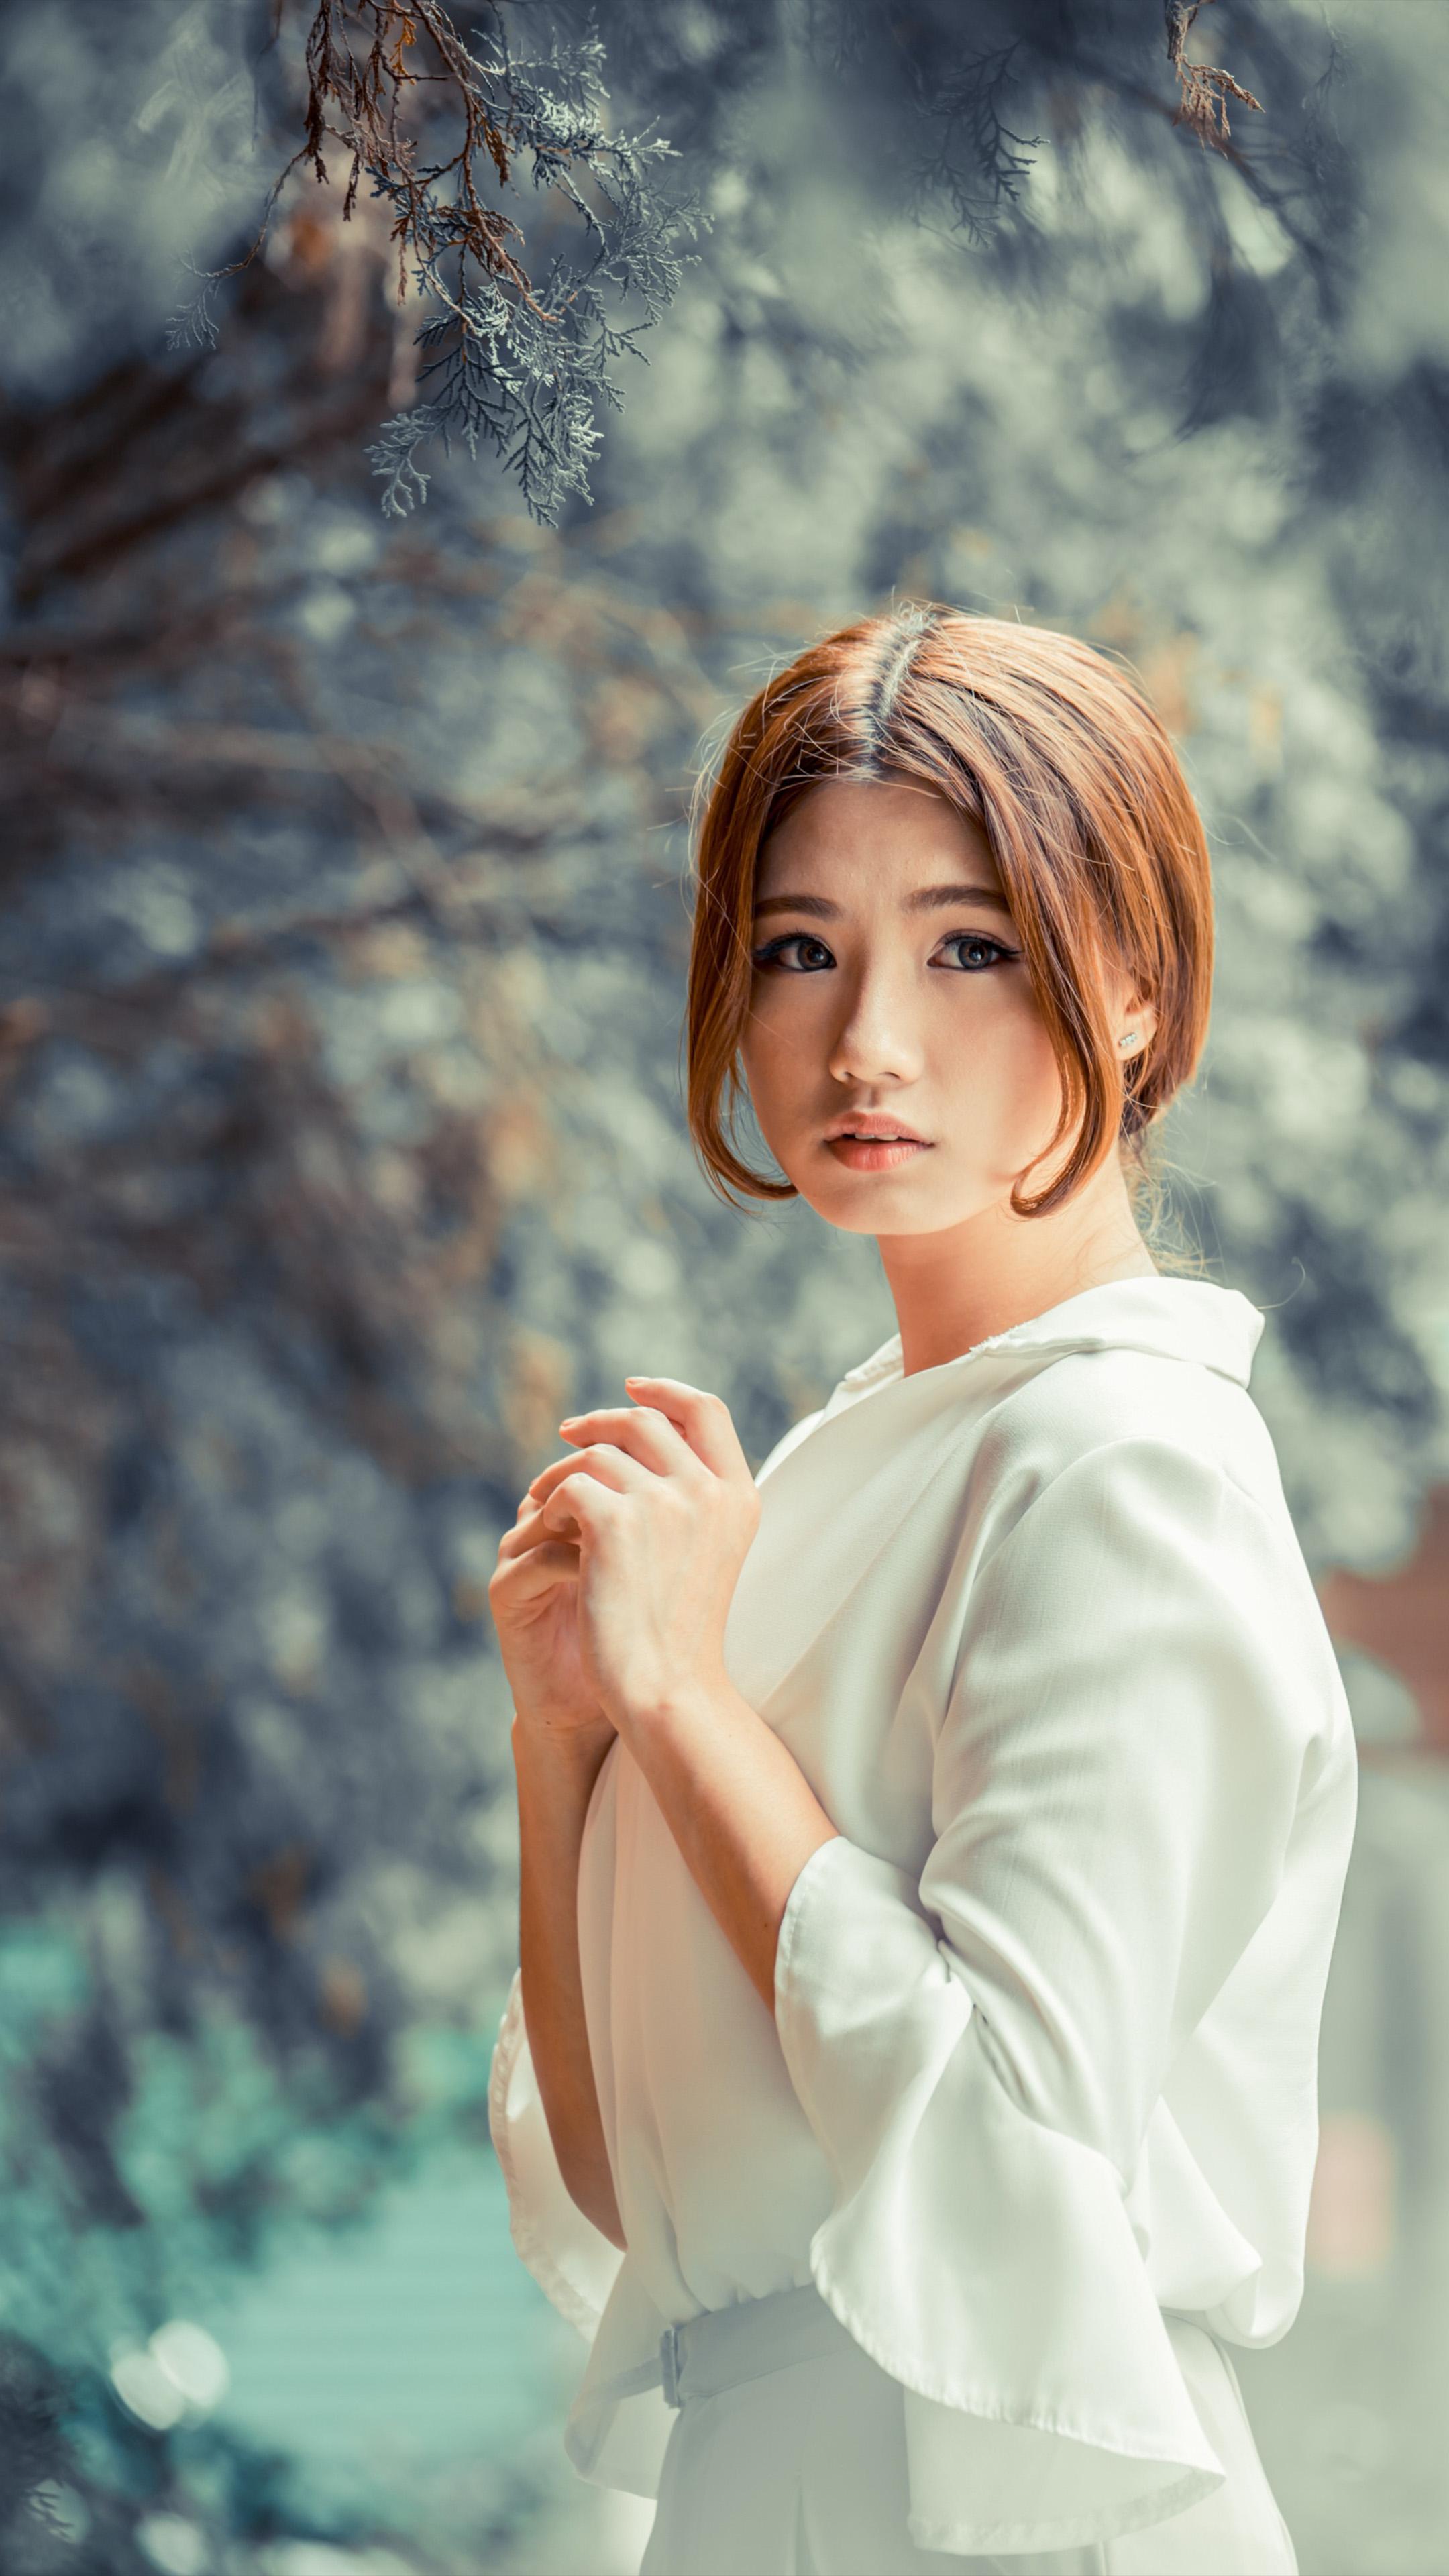 Download cute asian girl winter photoshoot free pure 4k - Asian girl 4k ...